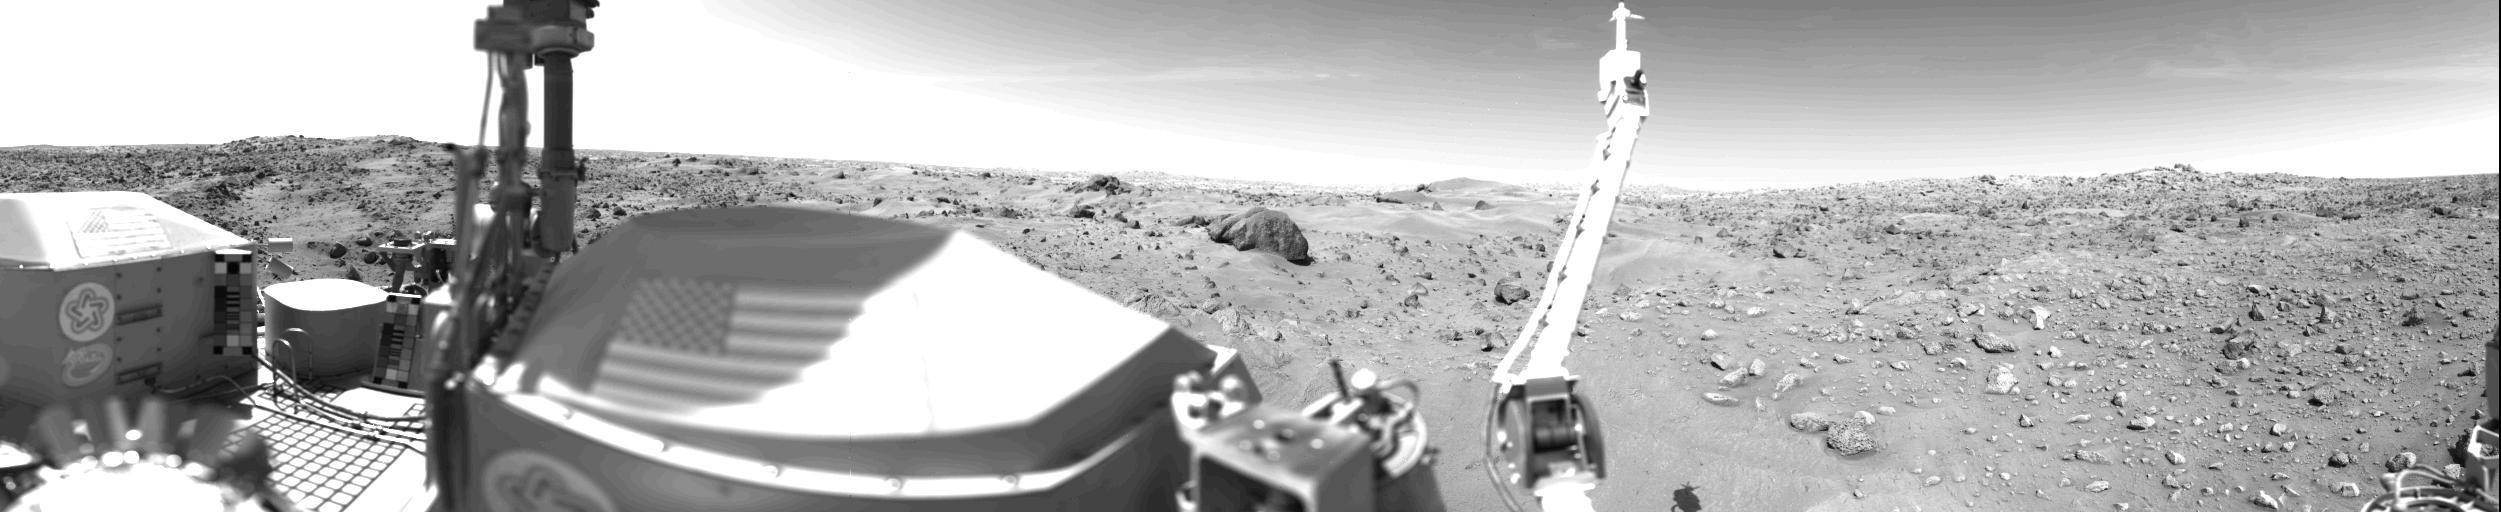 Images taken by the Viking Lander 1 Spacecraft